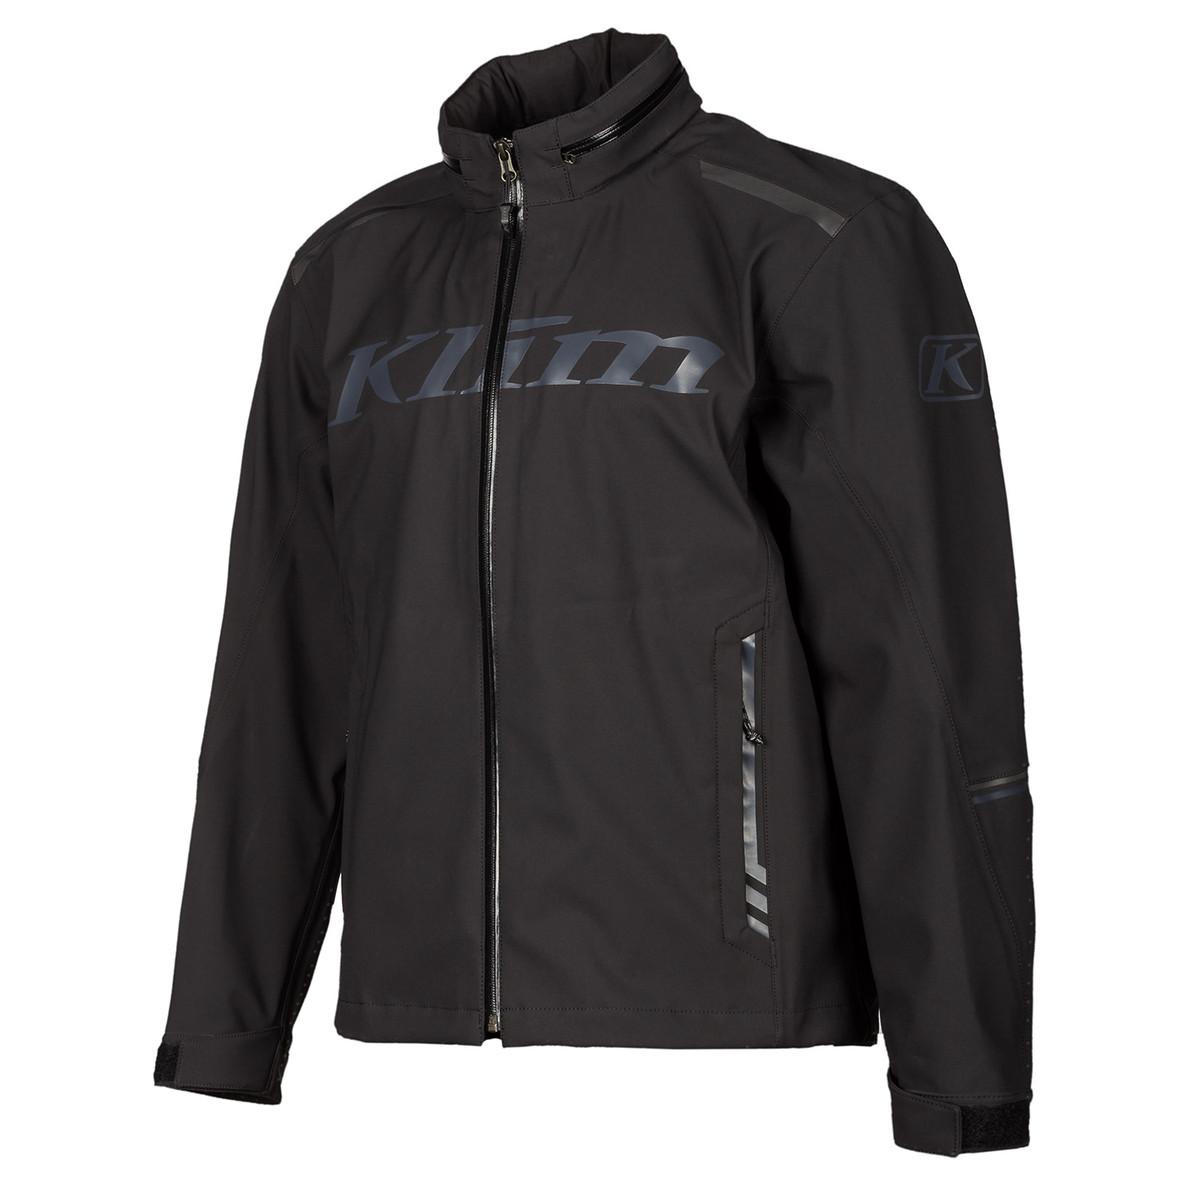 Enduro S4 Jacket Black